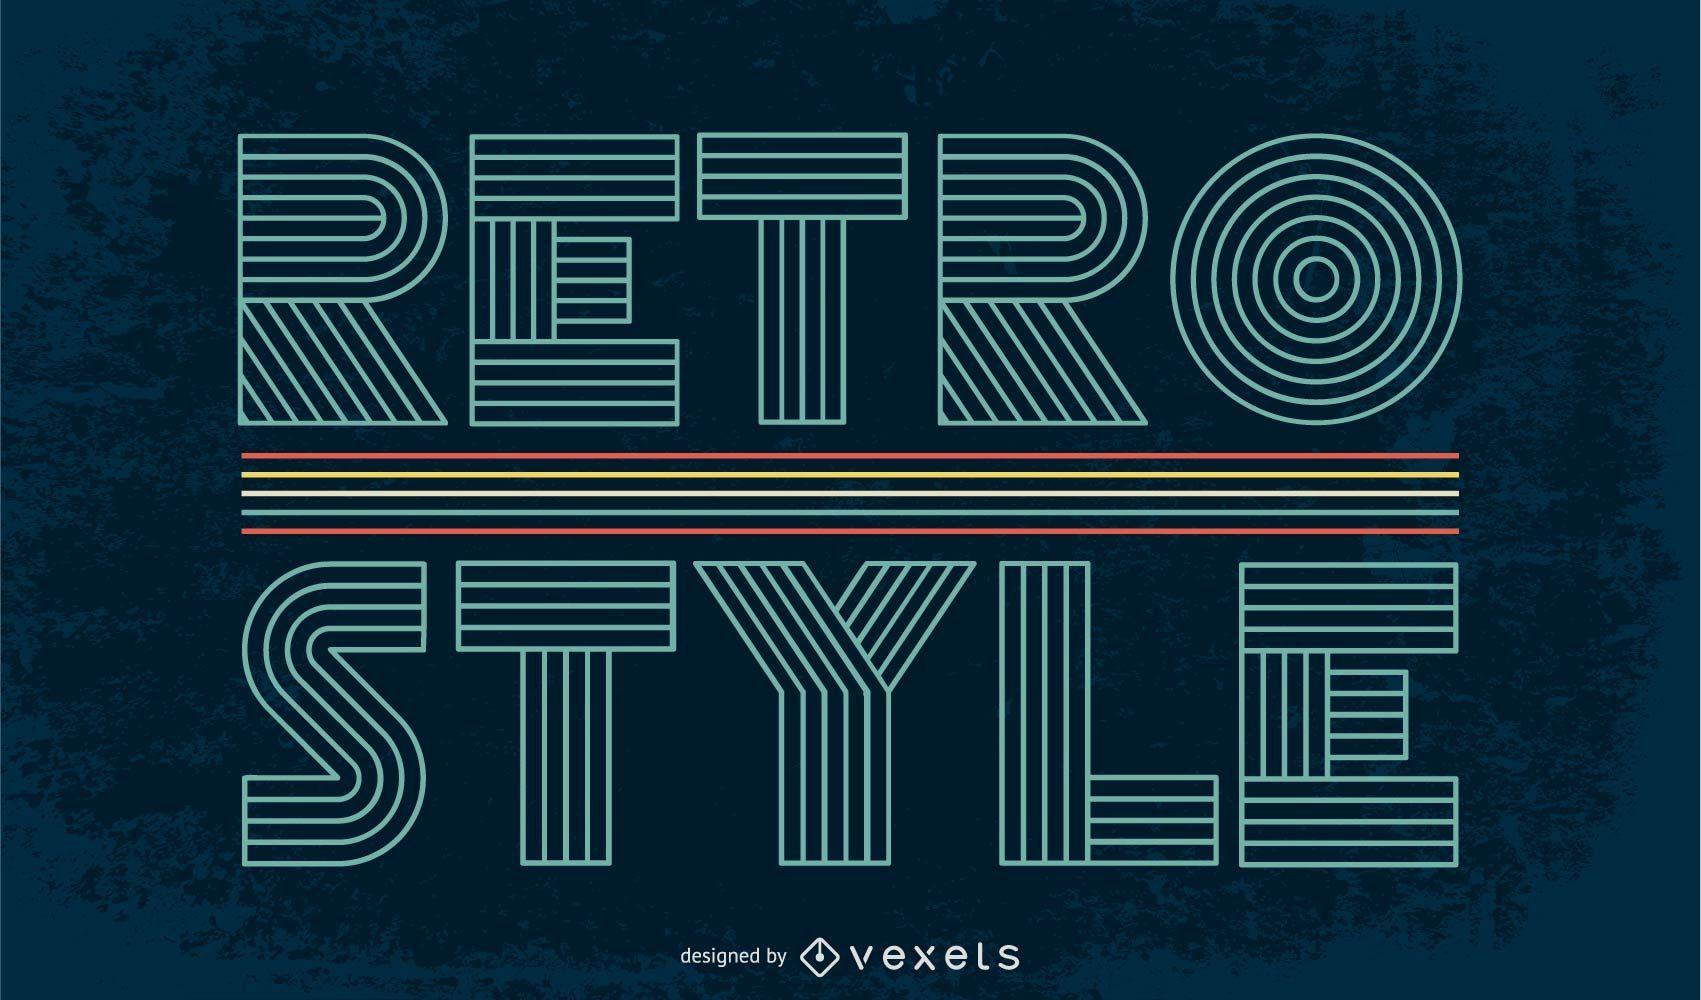 Retro Vector Backgrounds